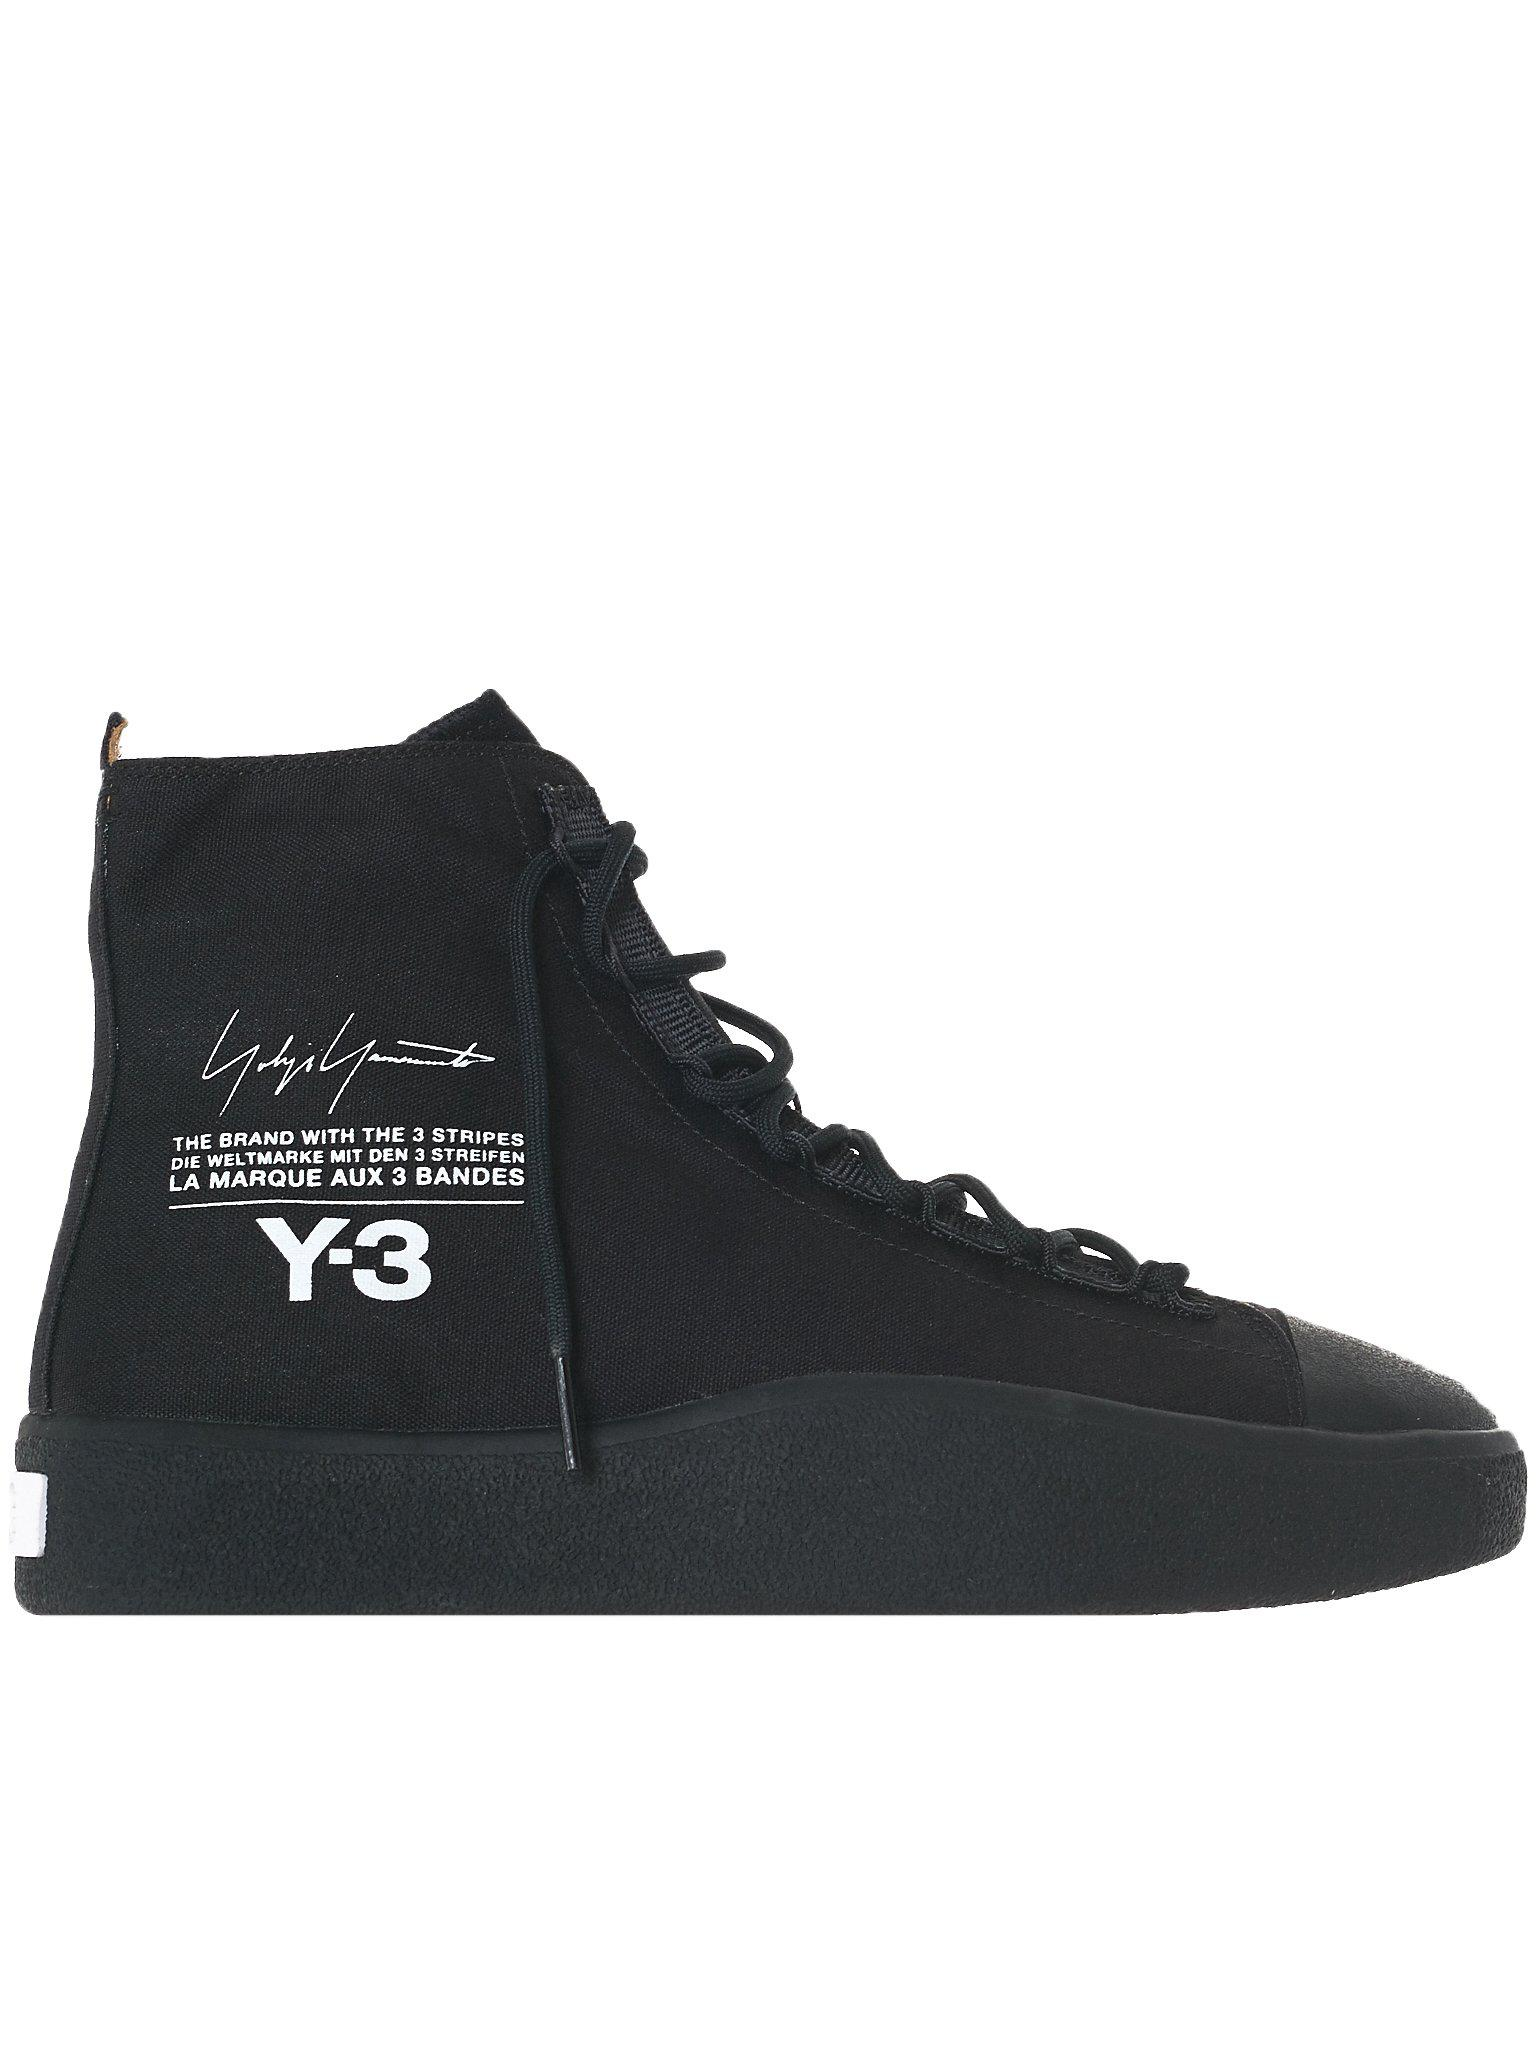 94188c922 Lyst - Y-3  bashyo  High-top Sneakers in Black for Men